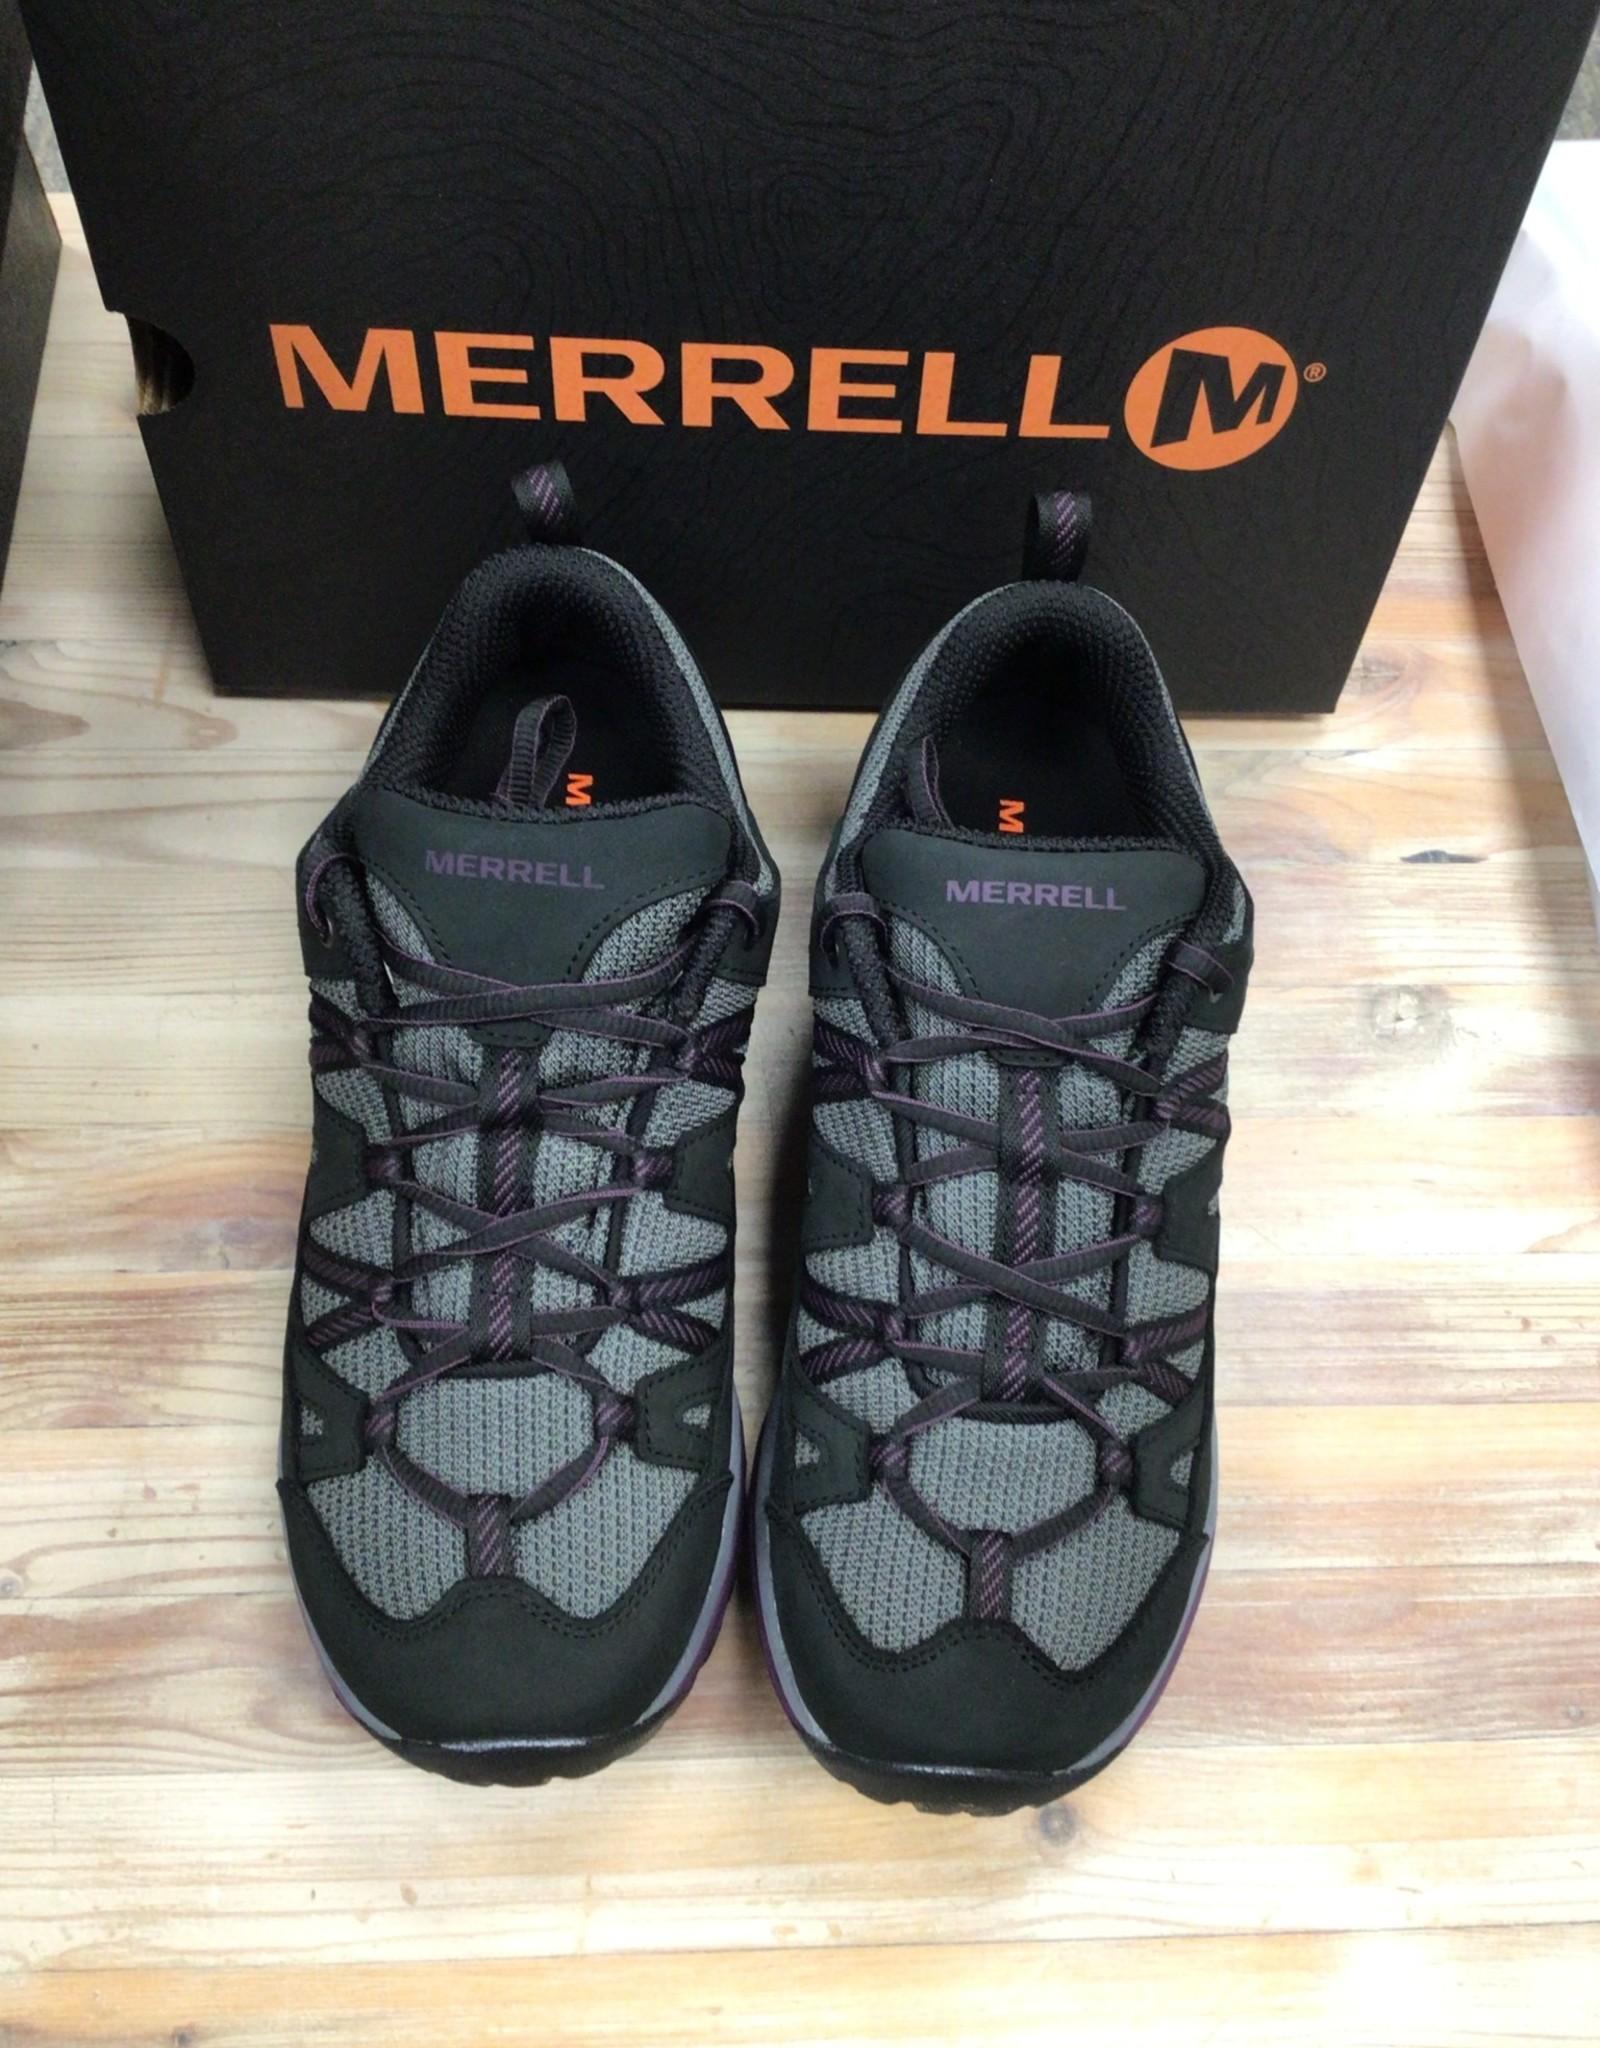 Merrell Merrell Siren Sport 3 WP Ladies'